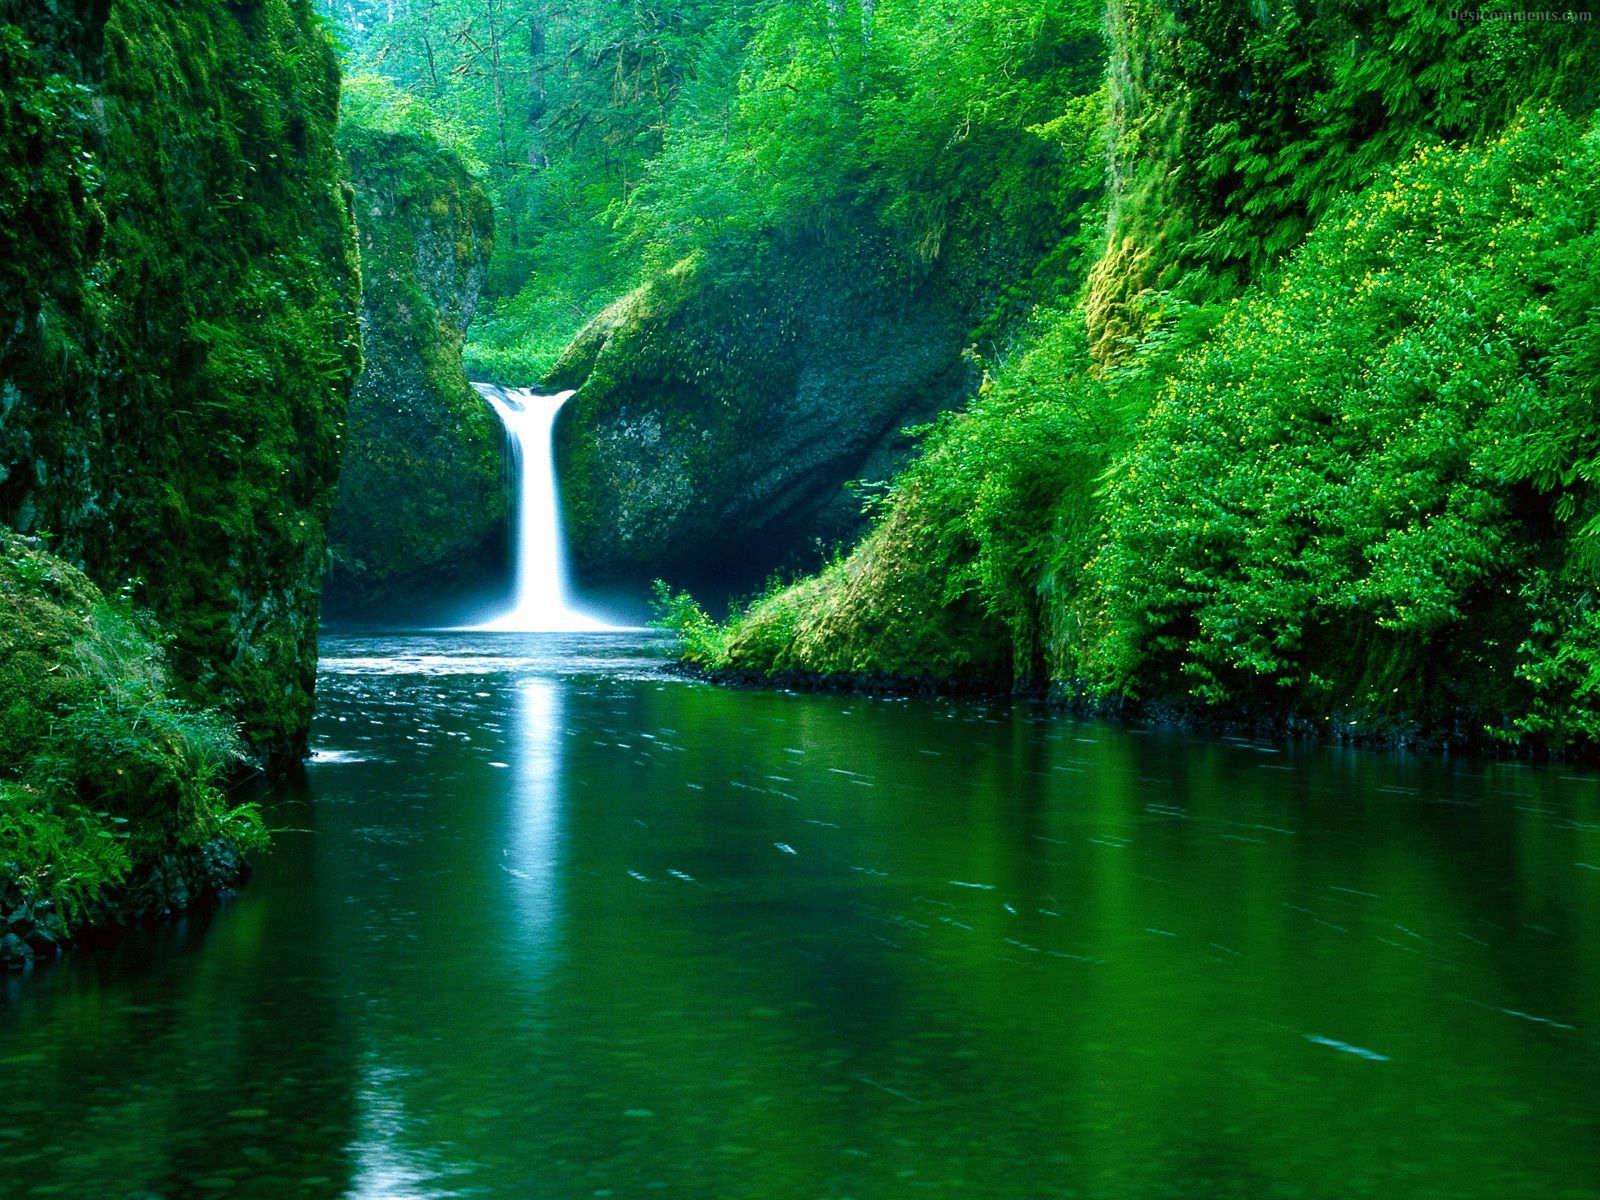 Waterfall Wallpaper 49 1600x1200